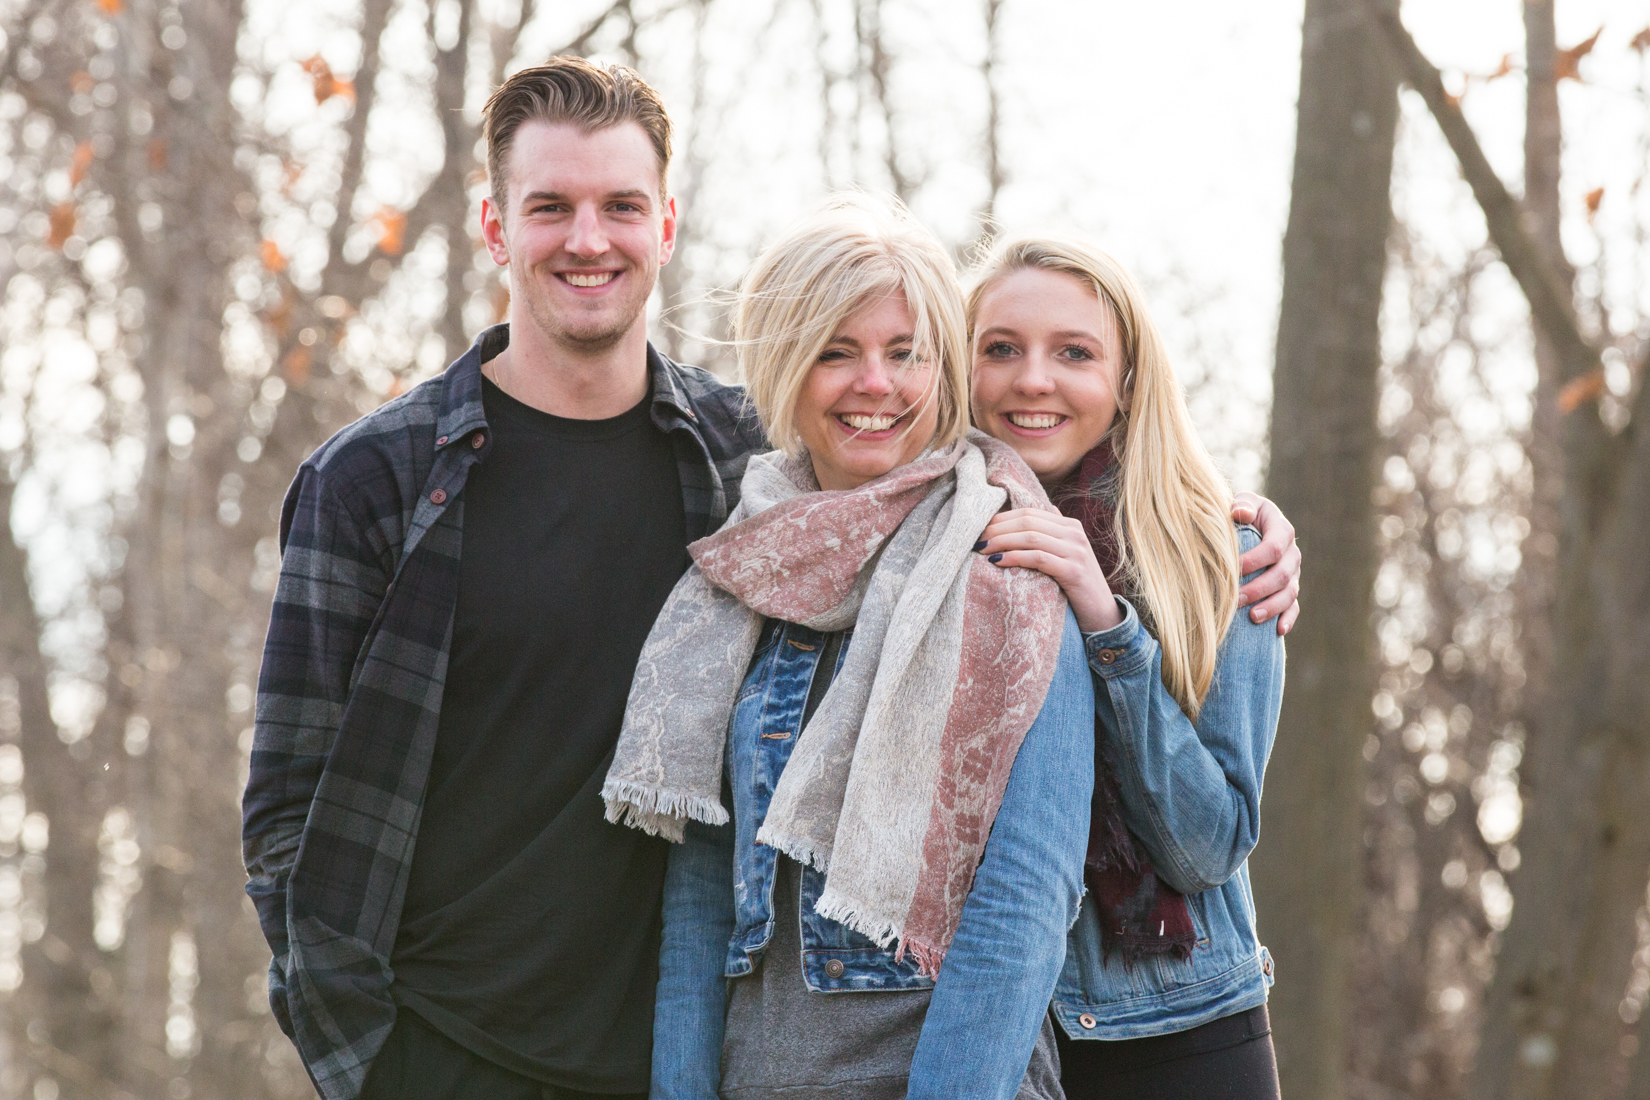 Family_Portrait_Vancouver_-Bolandia-0620.jpg